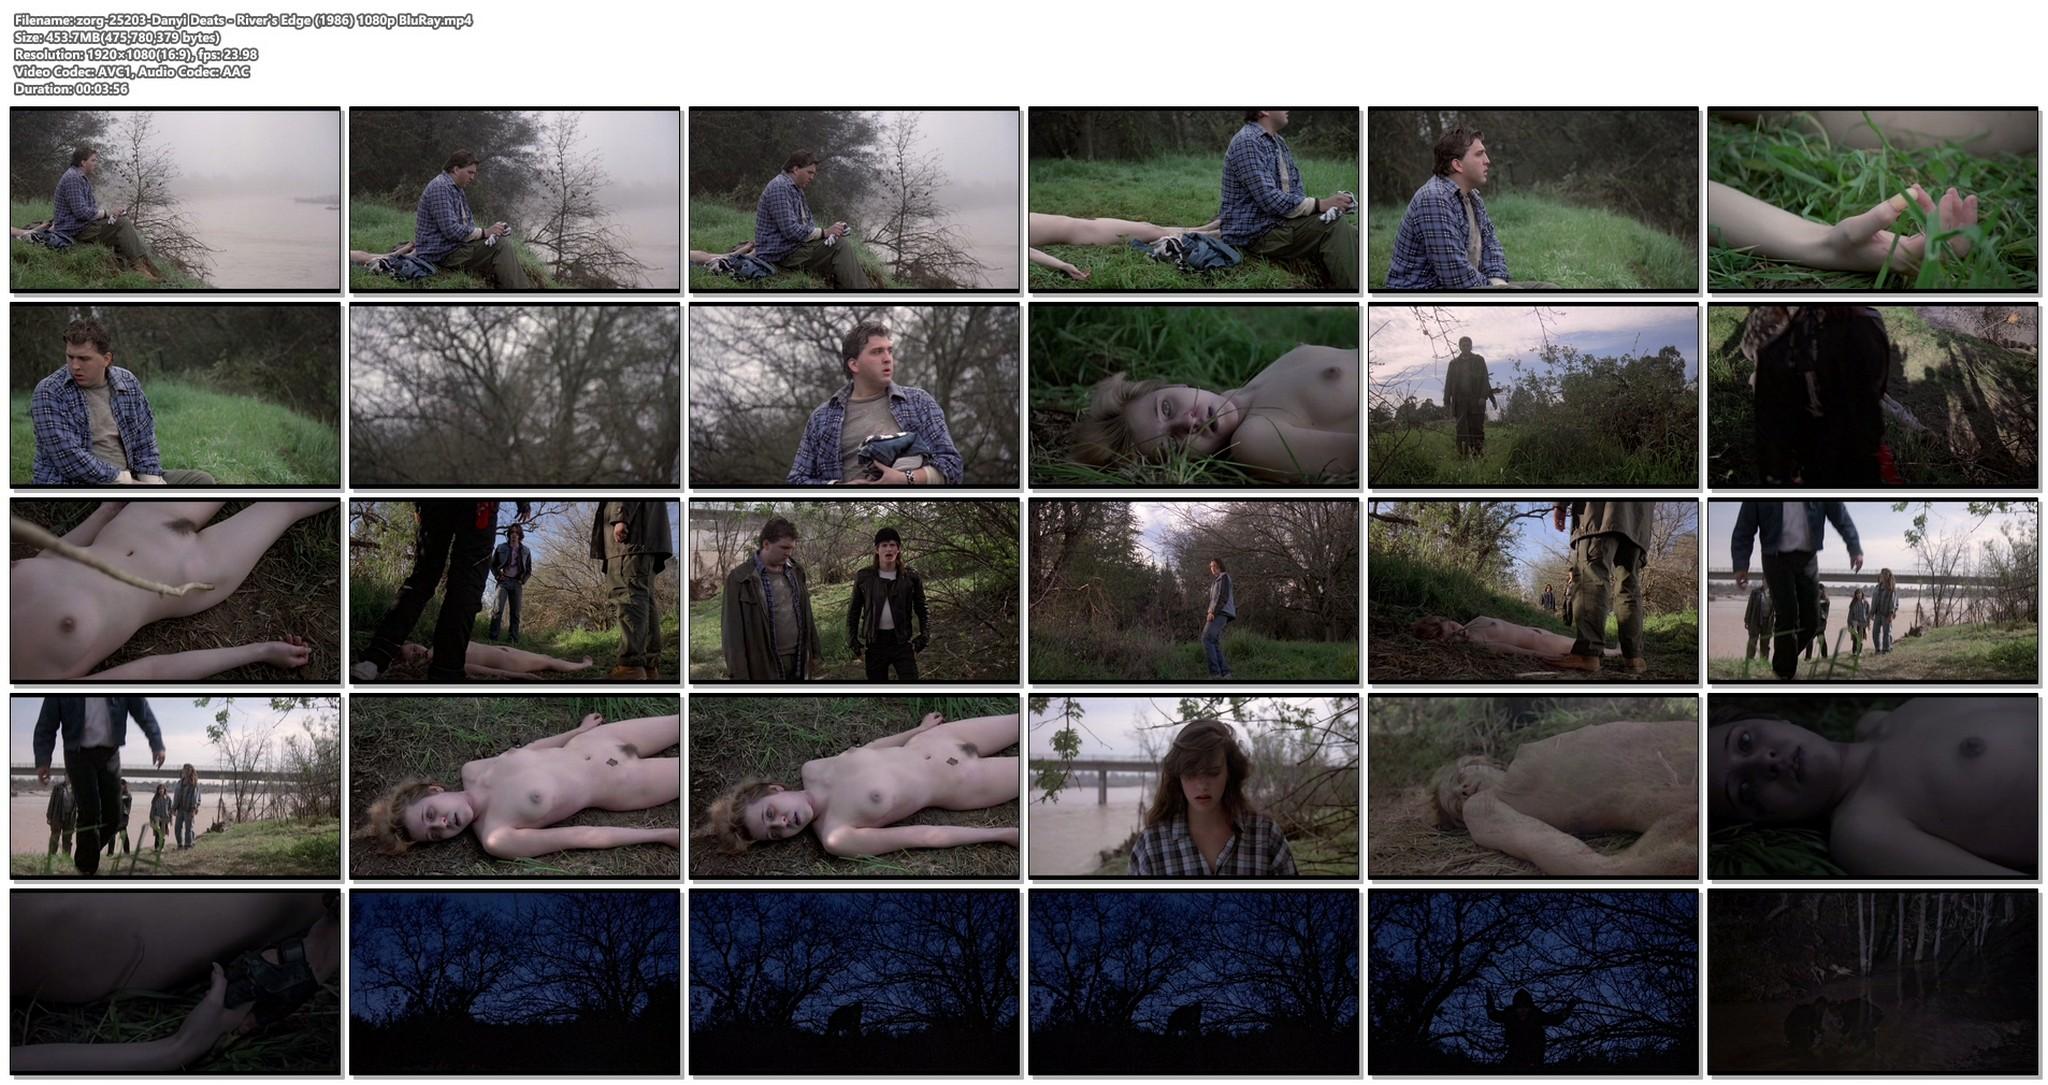 Danyi Deats nude bush topless but dead Rivers Edge 1986 HD 1080p BluRay 15